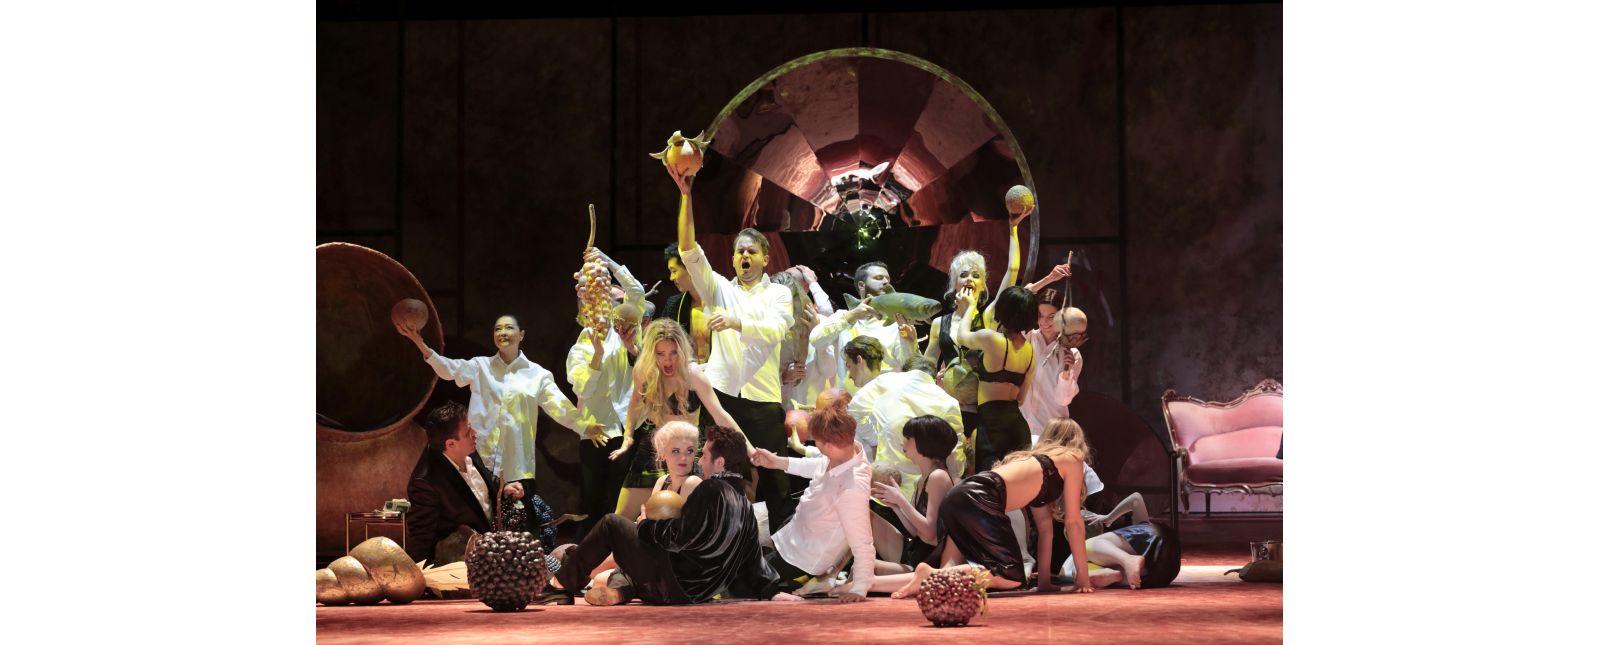 Don Giovanni // Juan Orozco // Opernchor // Inga Schäfer // Sarah Traubel // Jongsoo Yang // Matteo Macchioni // Tänzer_innen //  2019 // Foto: Paul Leclaire